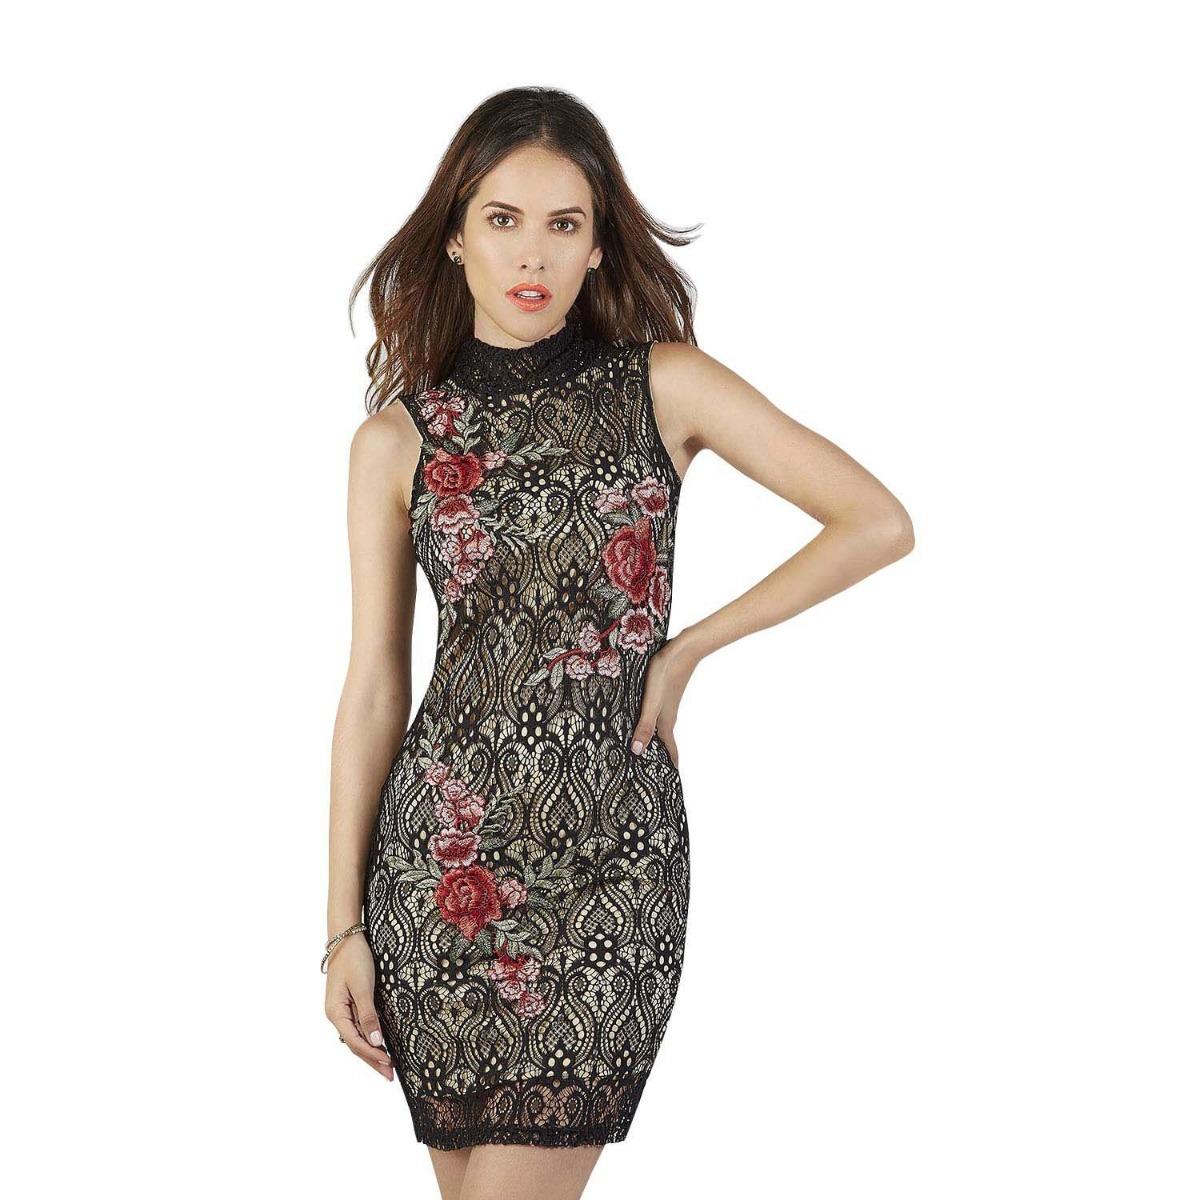 948789b334f22 vestido corto color negro con flores sin manga cuello alto. Cargando zoom.